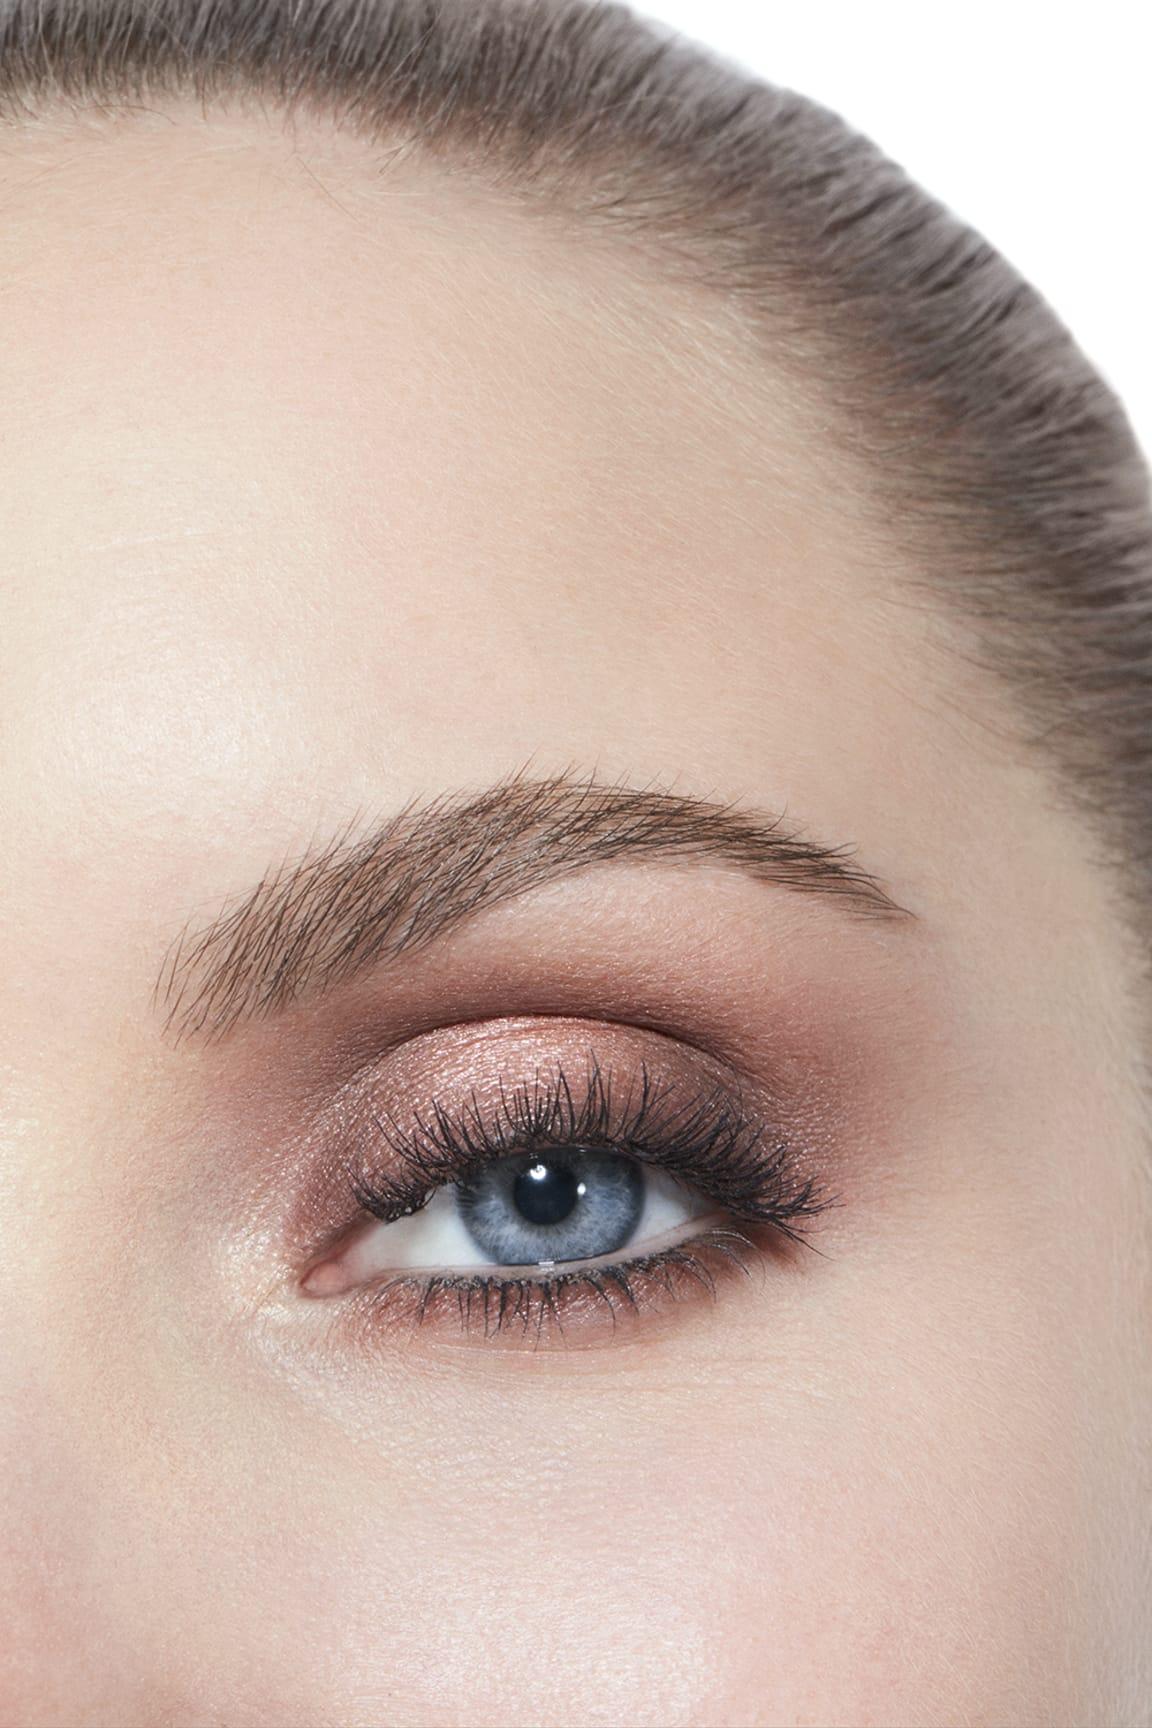 Application makeup visual 3 - LES 4 OMBRES 204 - TISSÉ VENDÔME